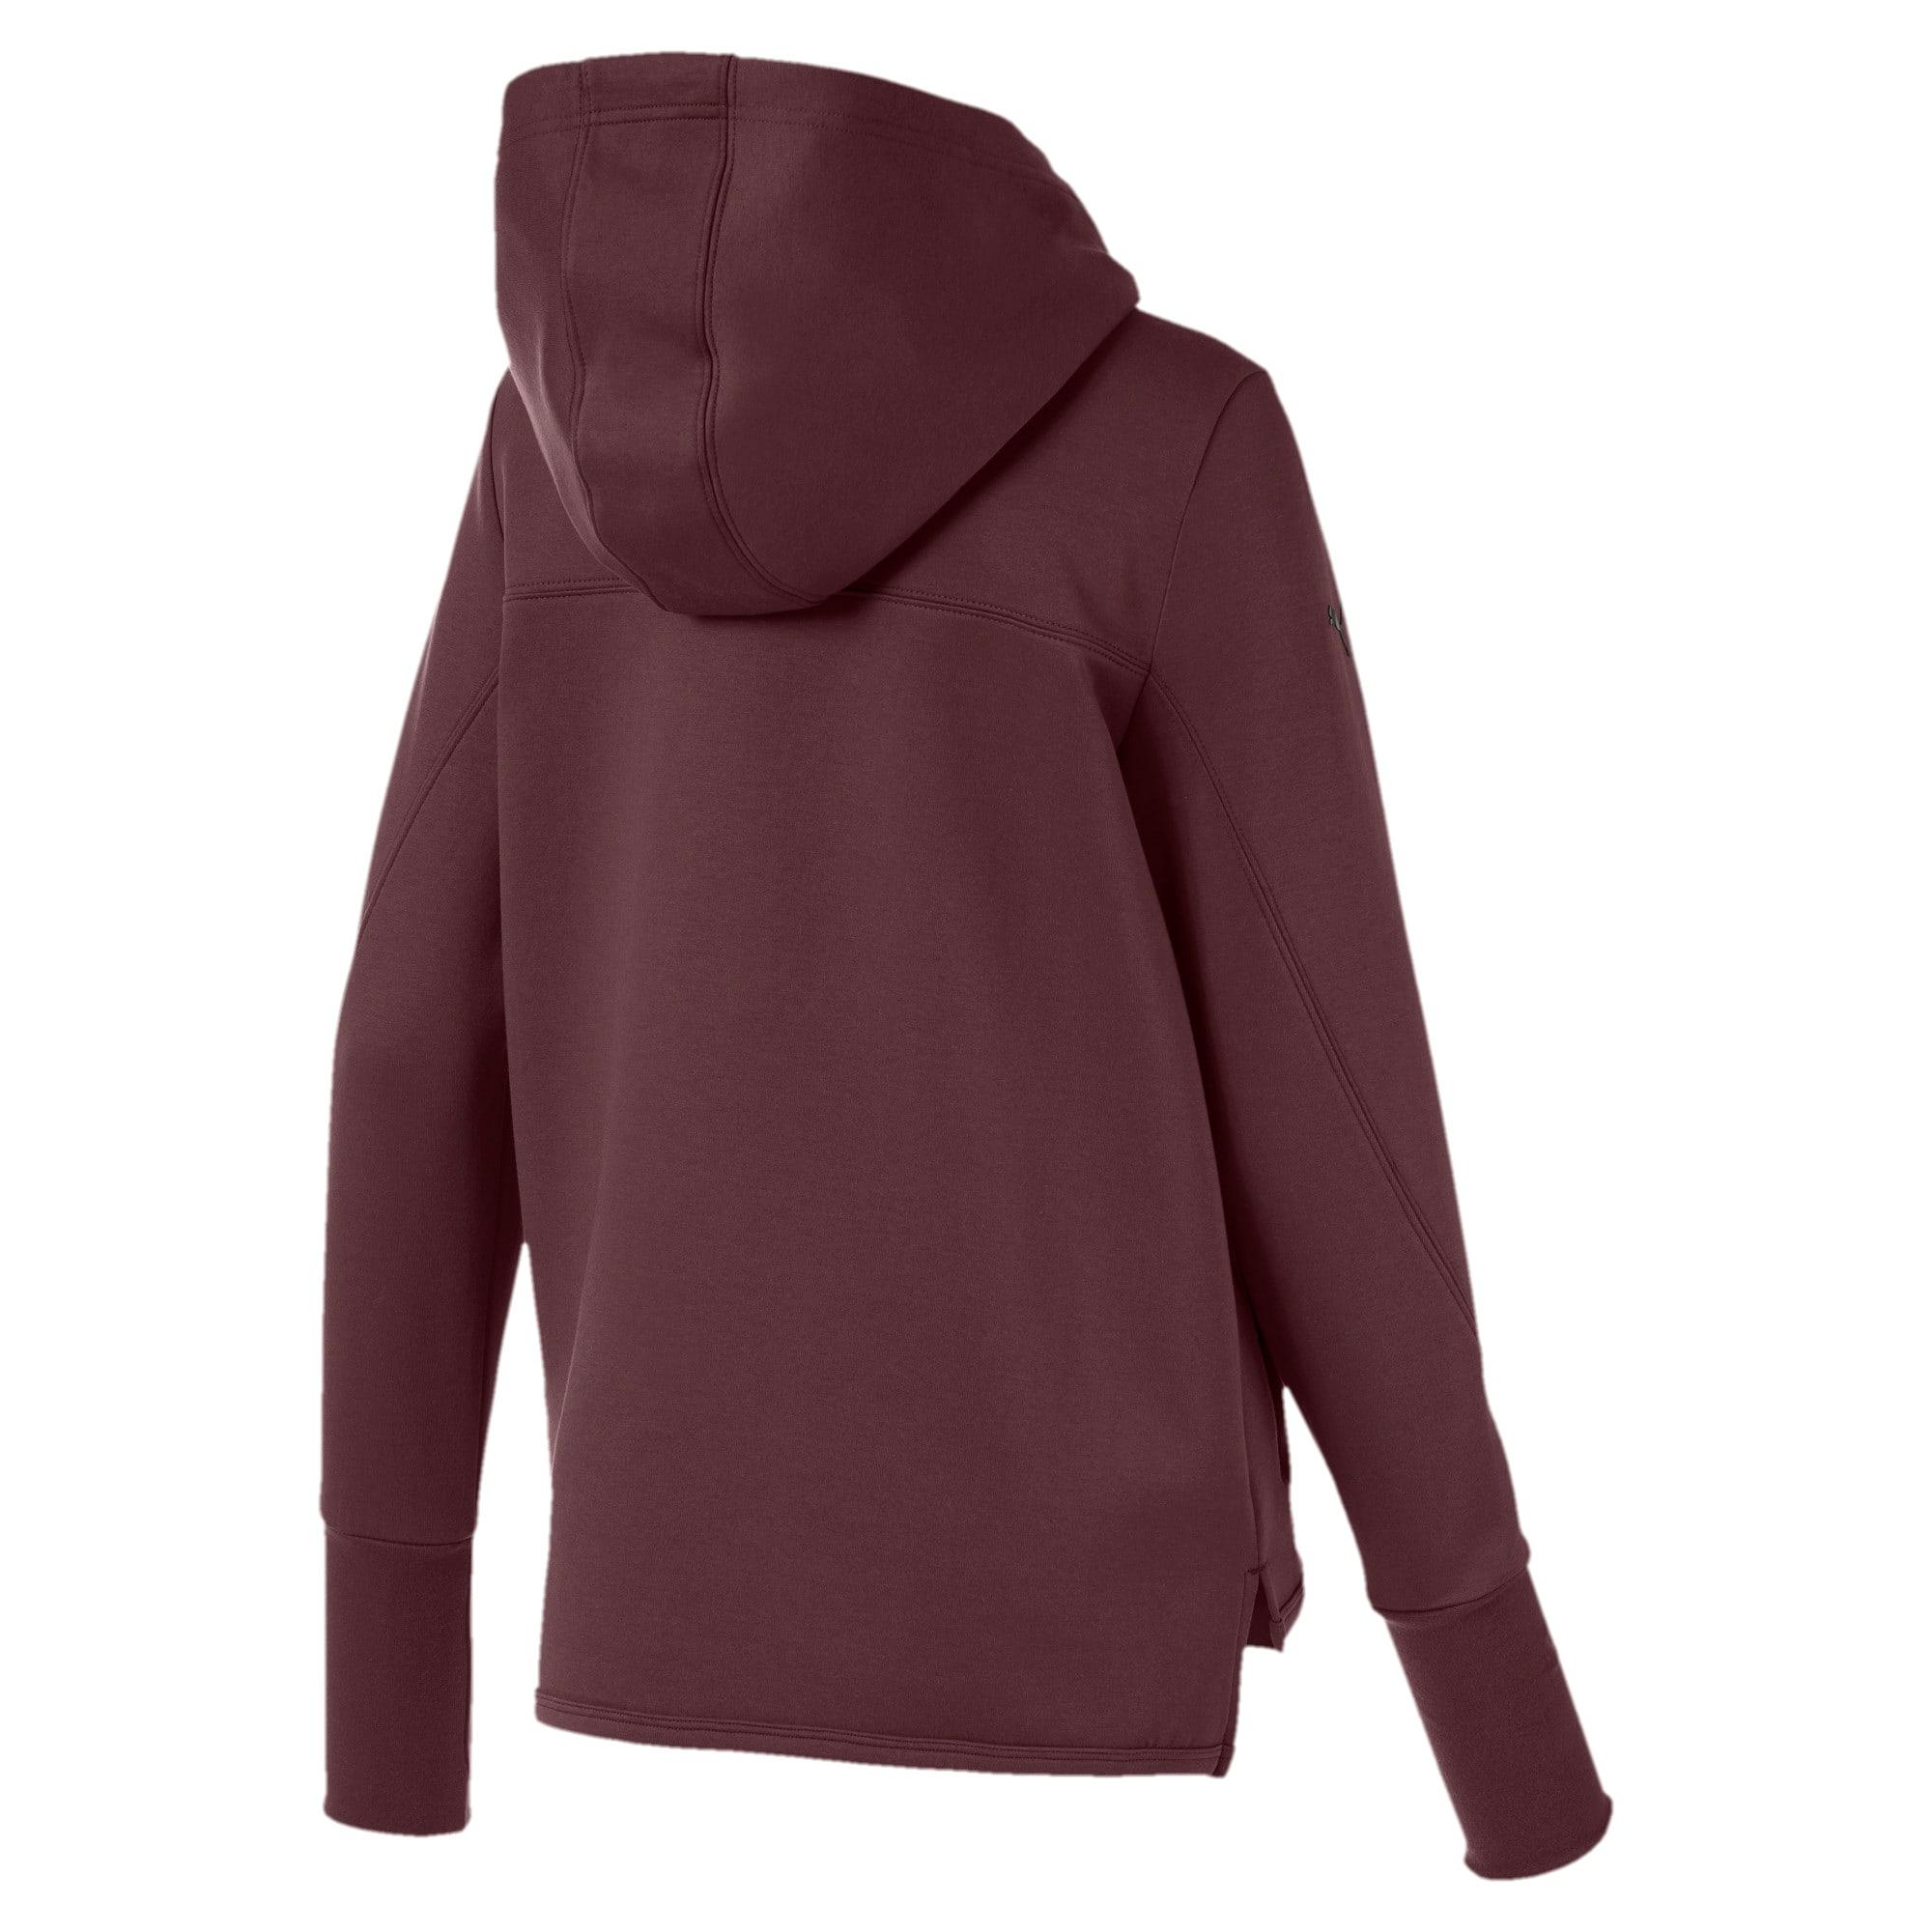 Thumbnail 2 of Scuderia Ferrari Women's Hooded Sweat Jacket, Vineyard Wine, medium